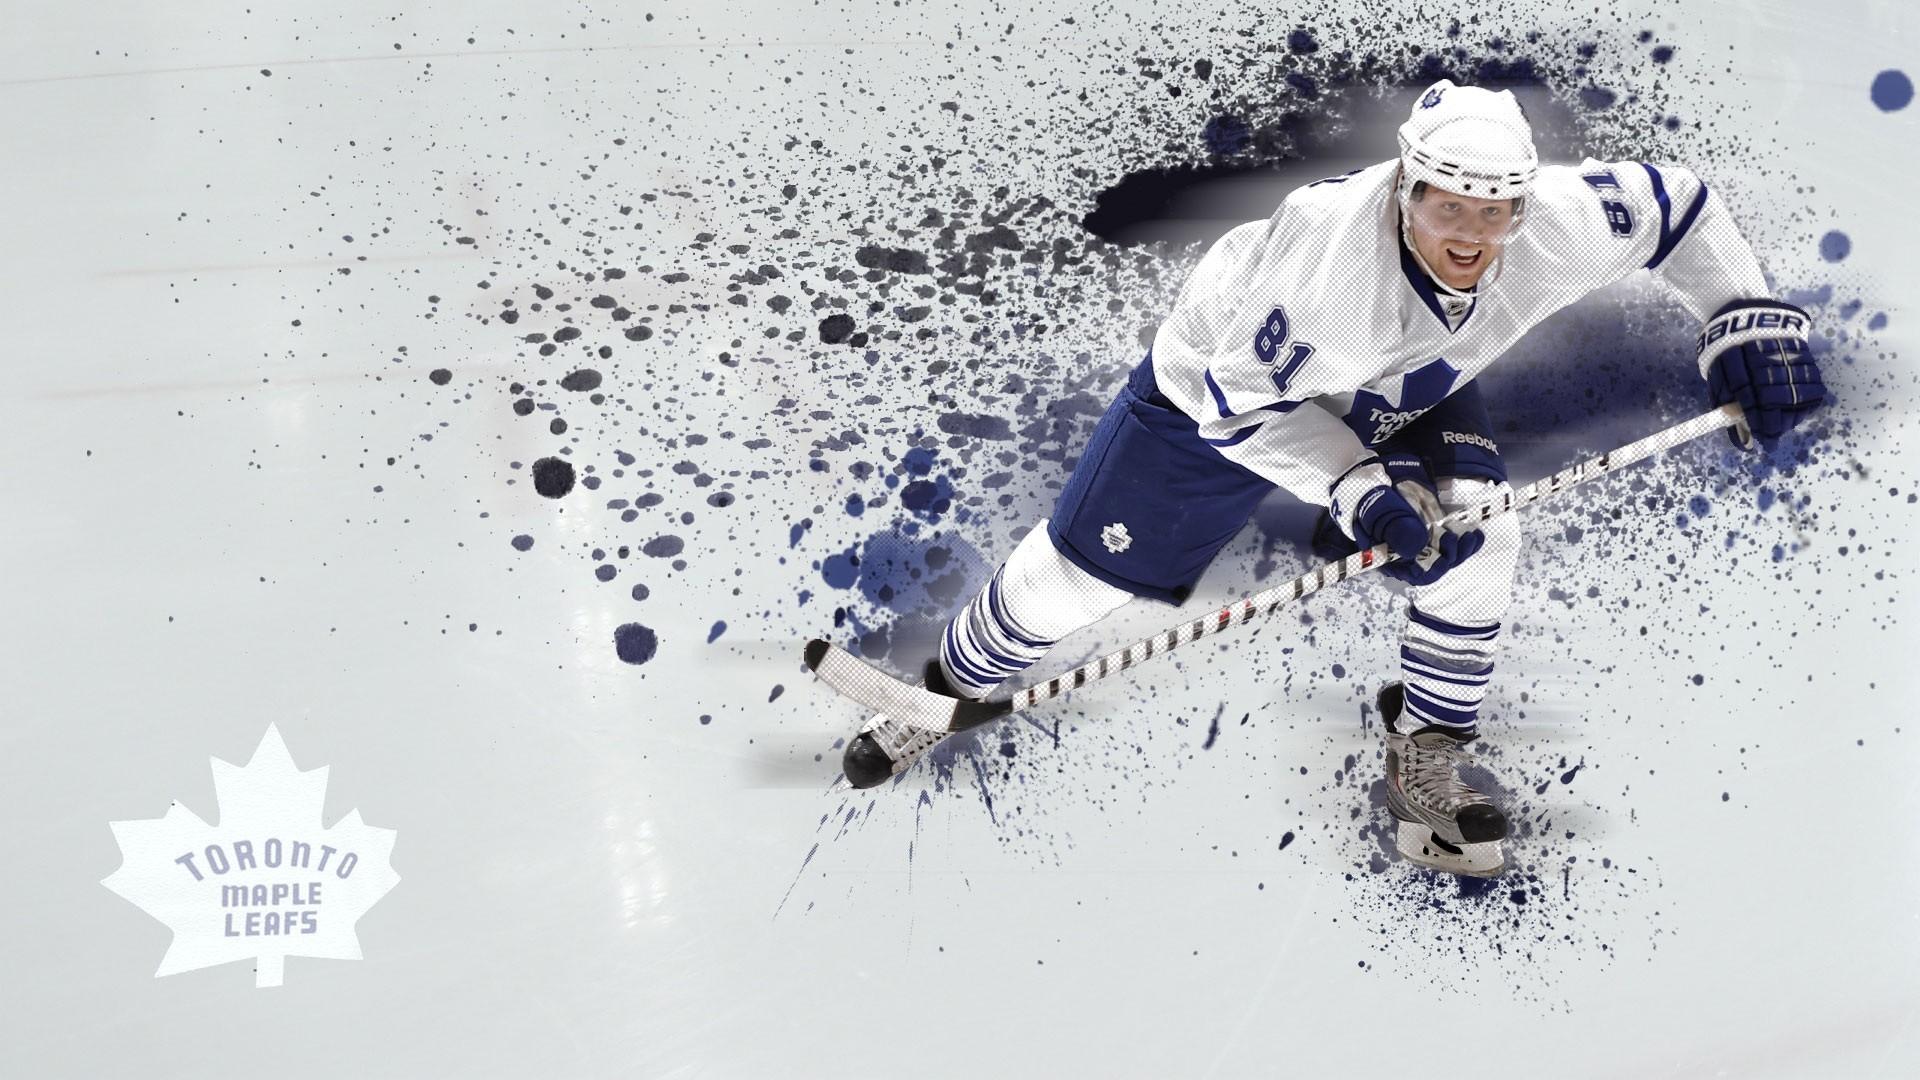 Hockey Phil Kessel Toronto Maple Leafs wallpaper .